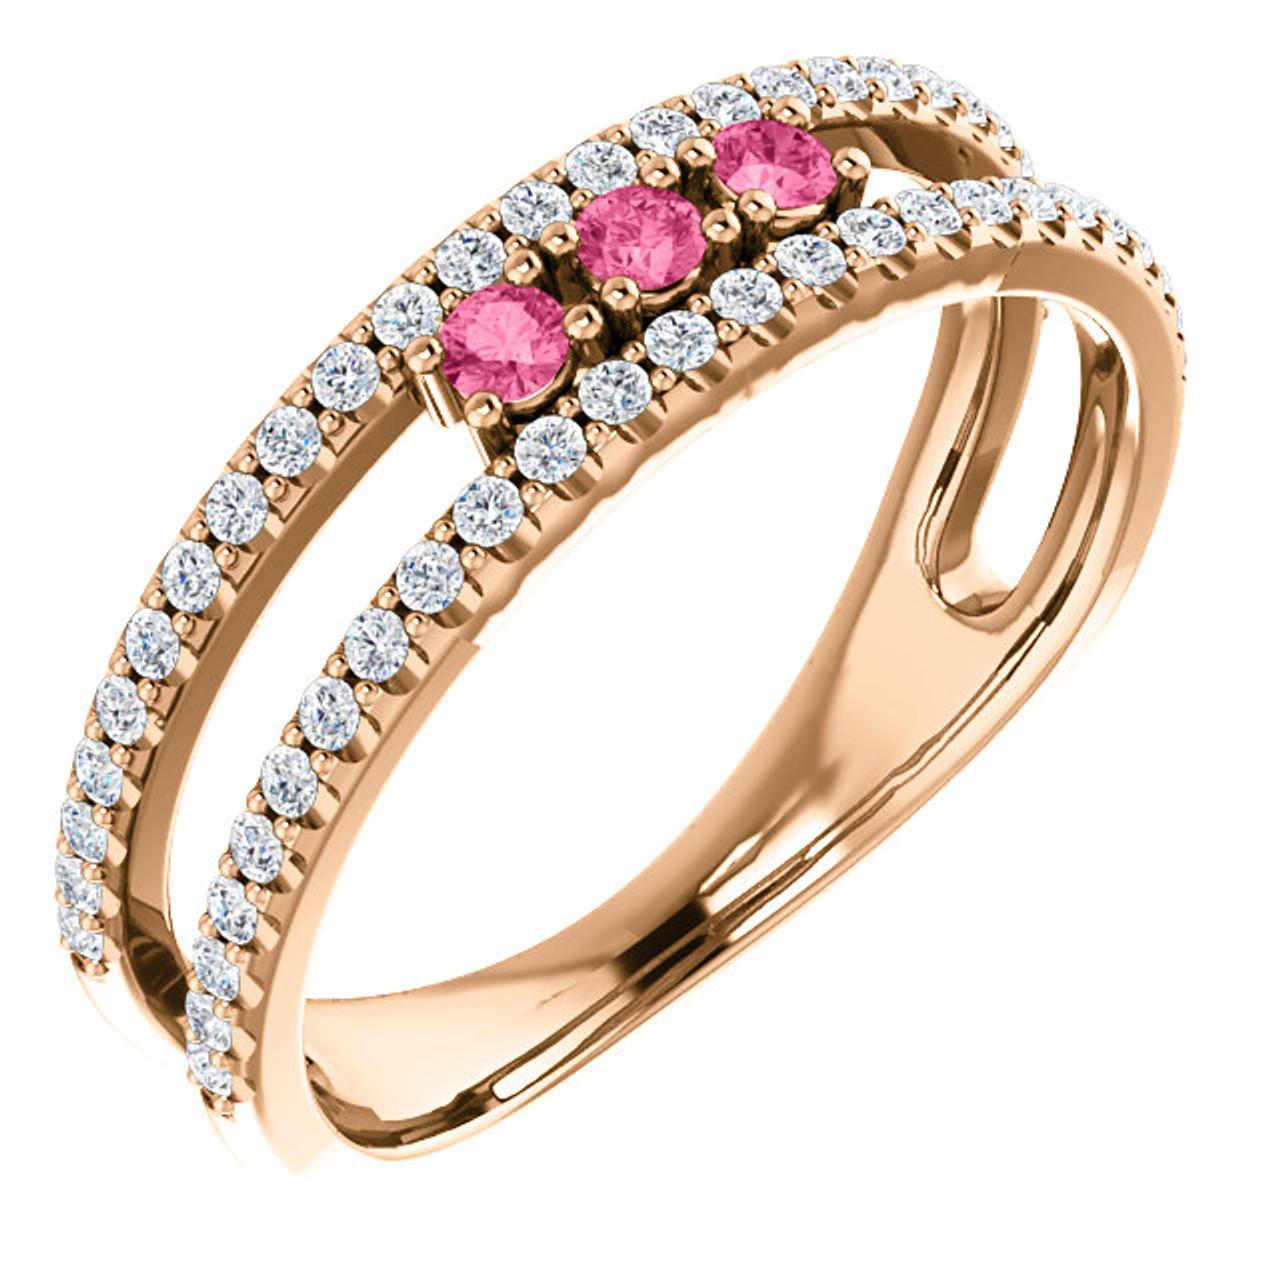 Half Eternity 7 Stone Pink Tourmaline Wedding Band